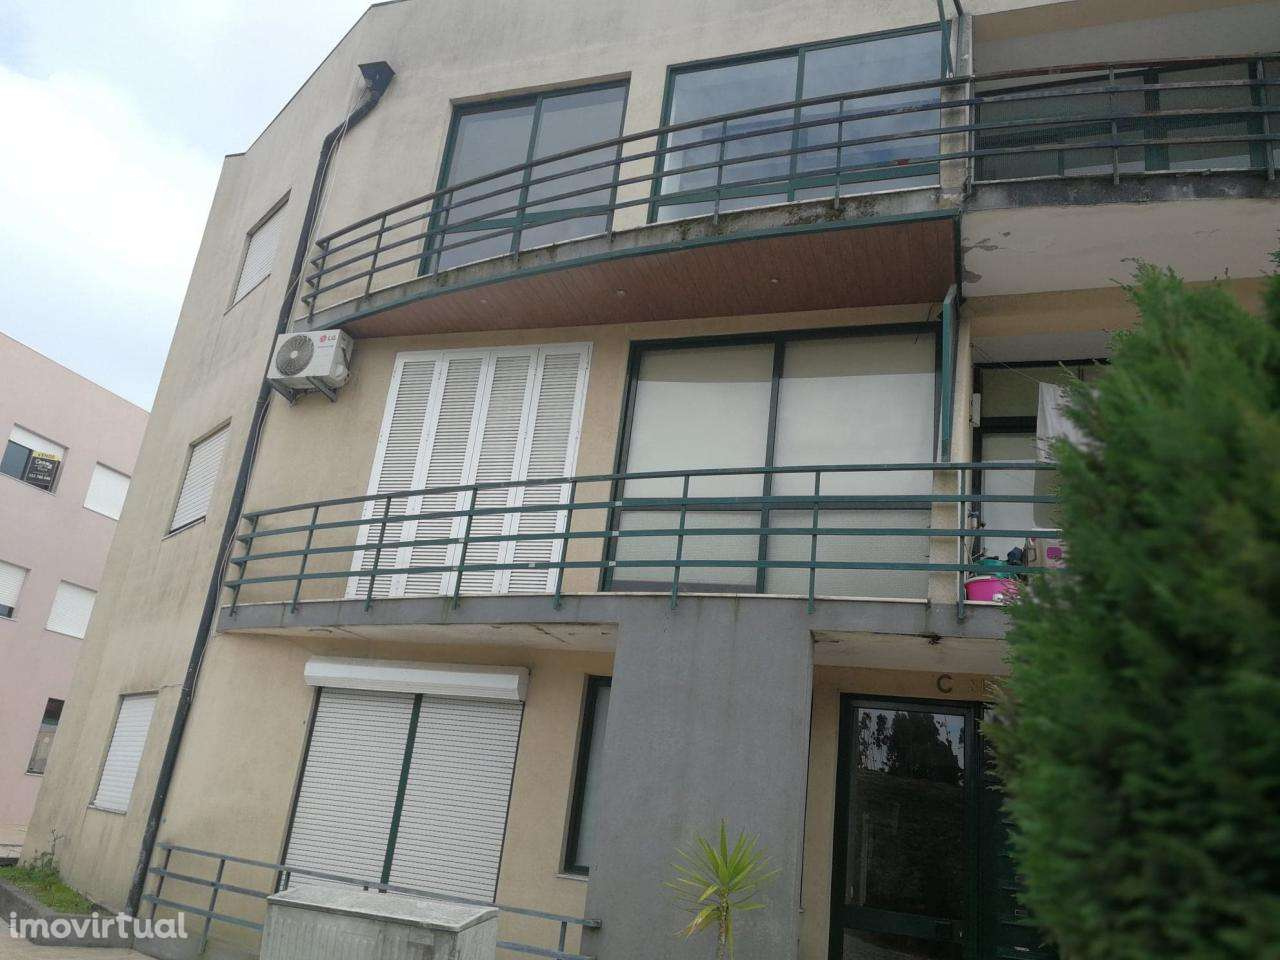 Apartamento para comprar, Vilela, Paredes, Porto - Foto 1